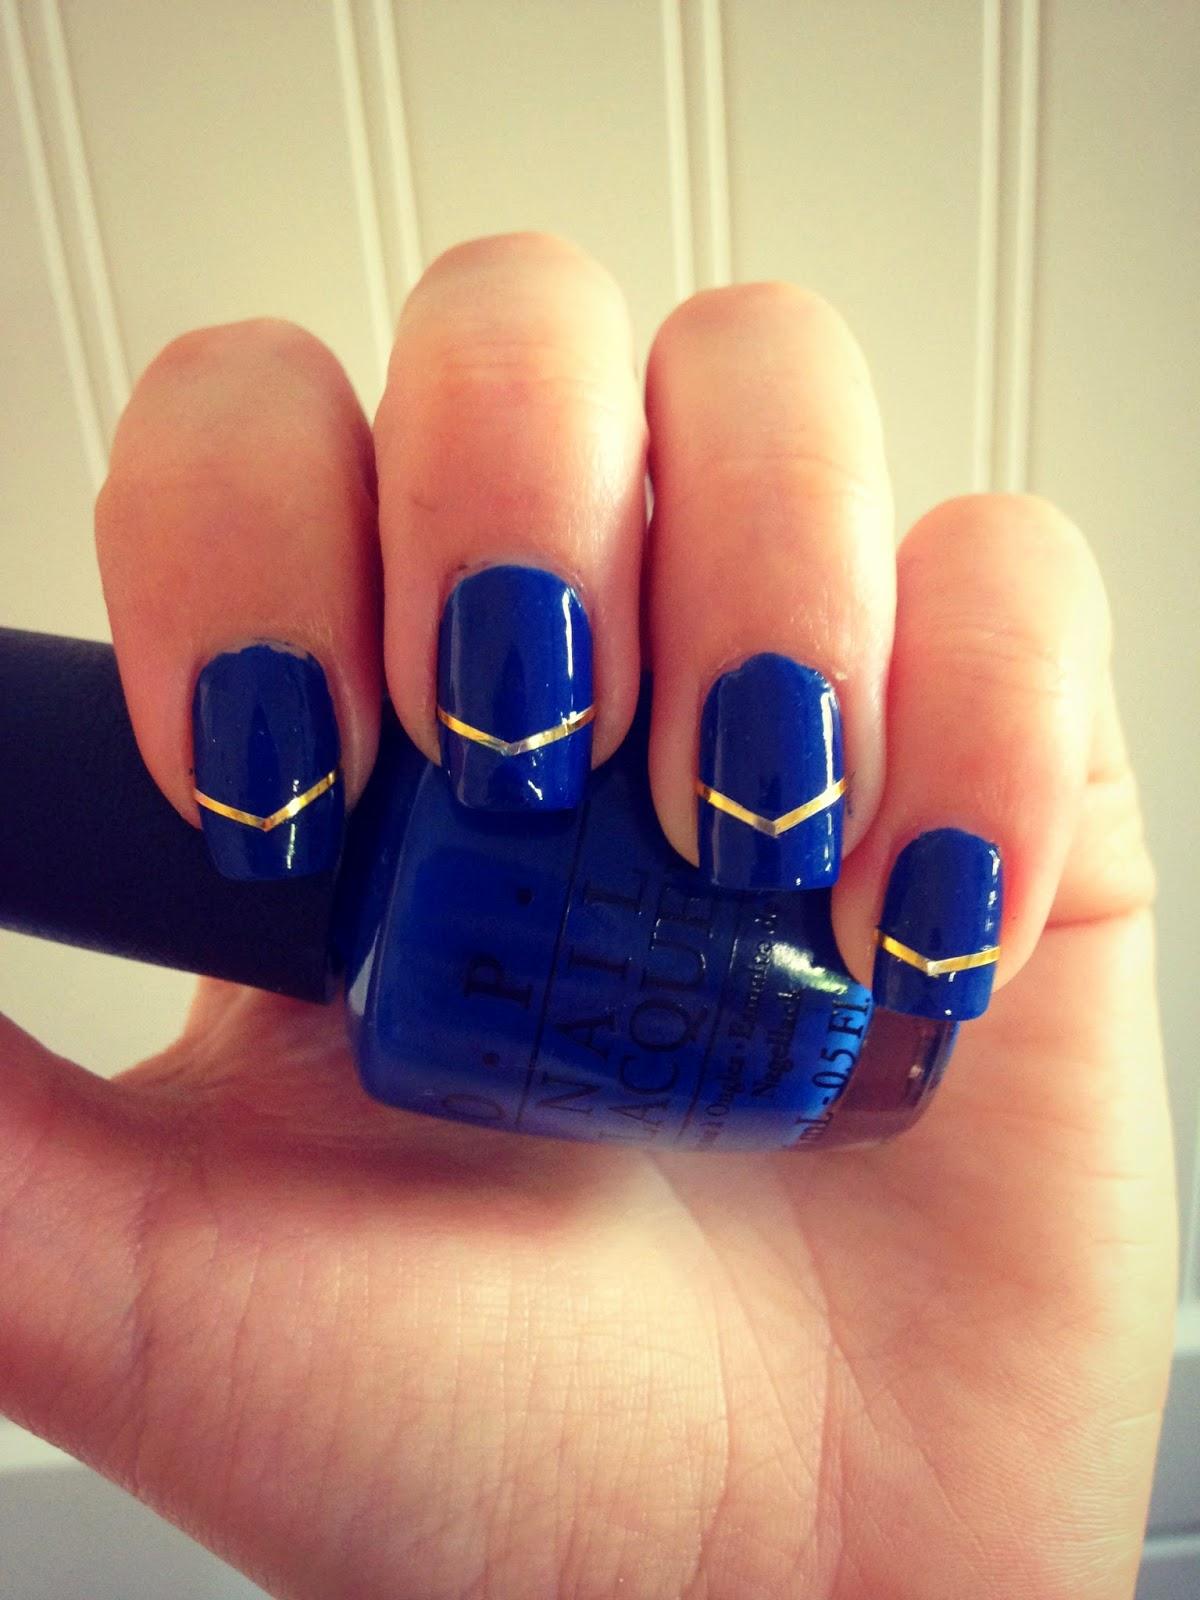 OPI Blue manicure